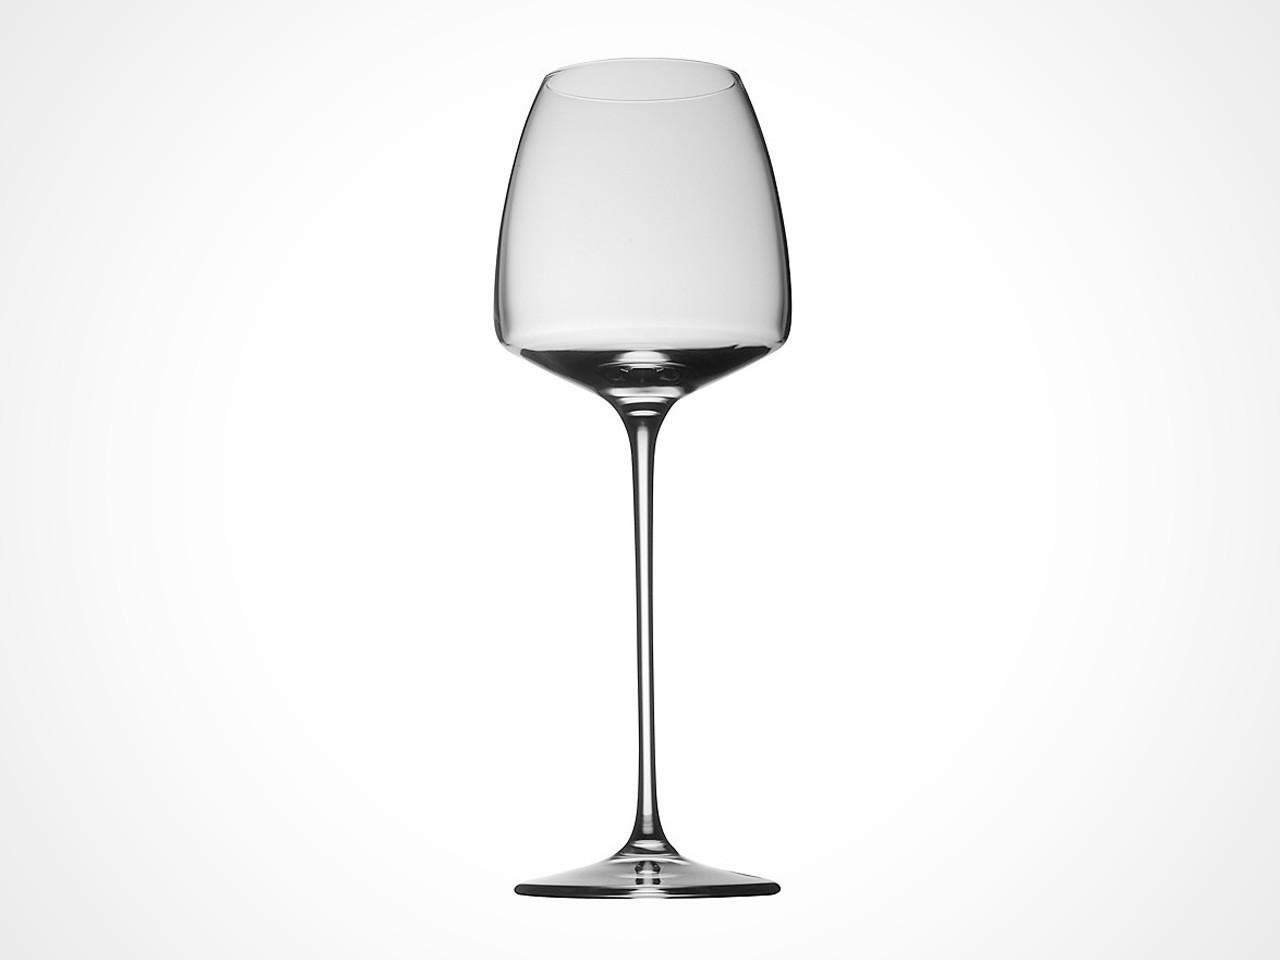 Rosenthal TAC 02 wine glasses before gray backdrop